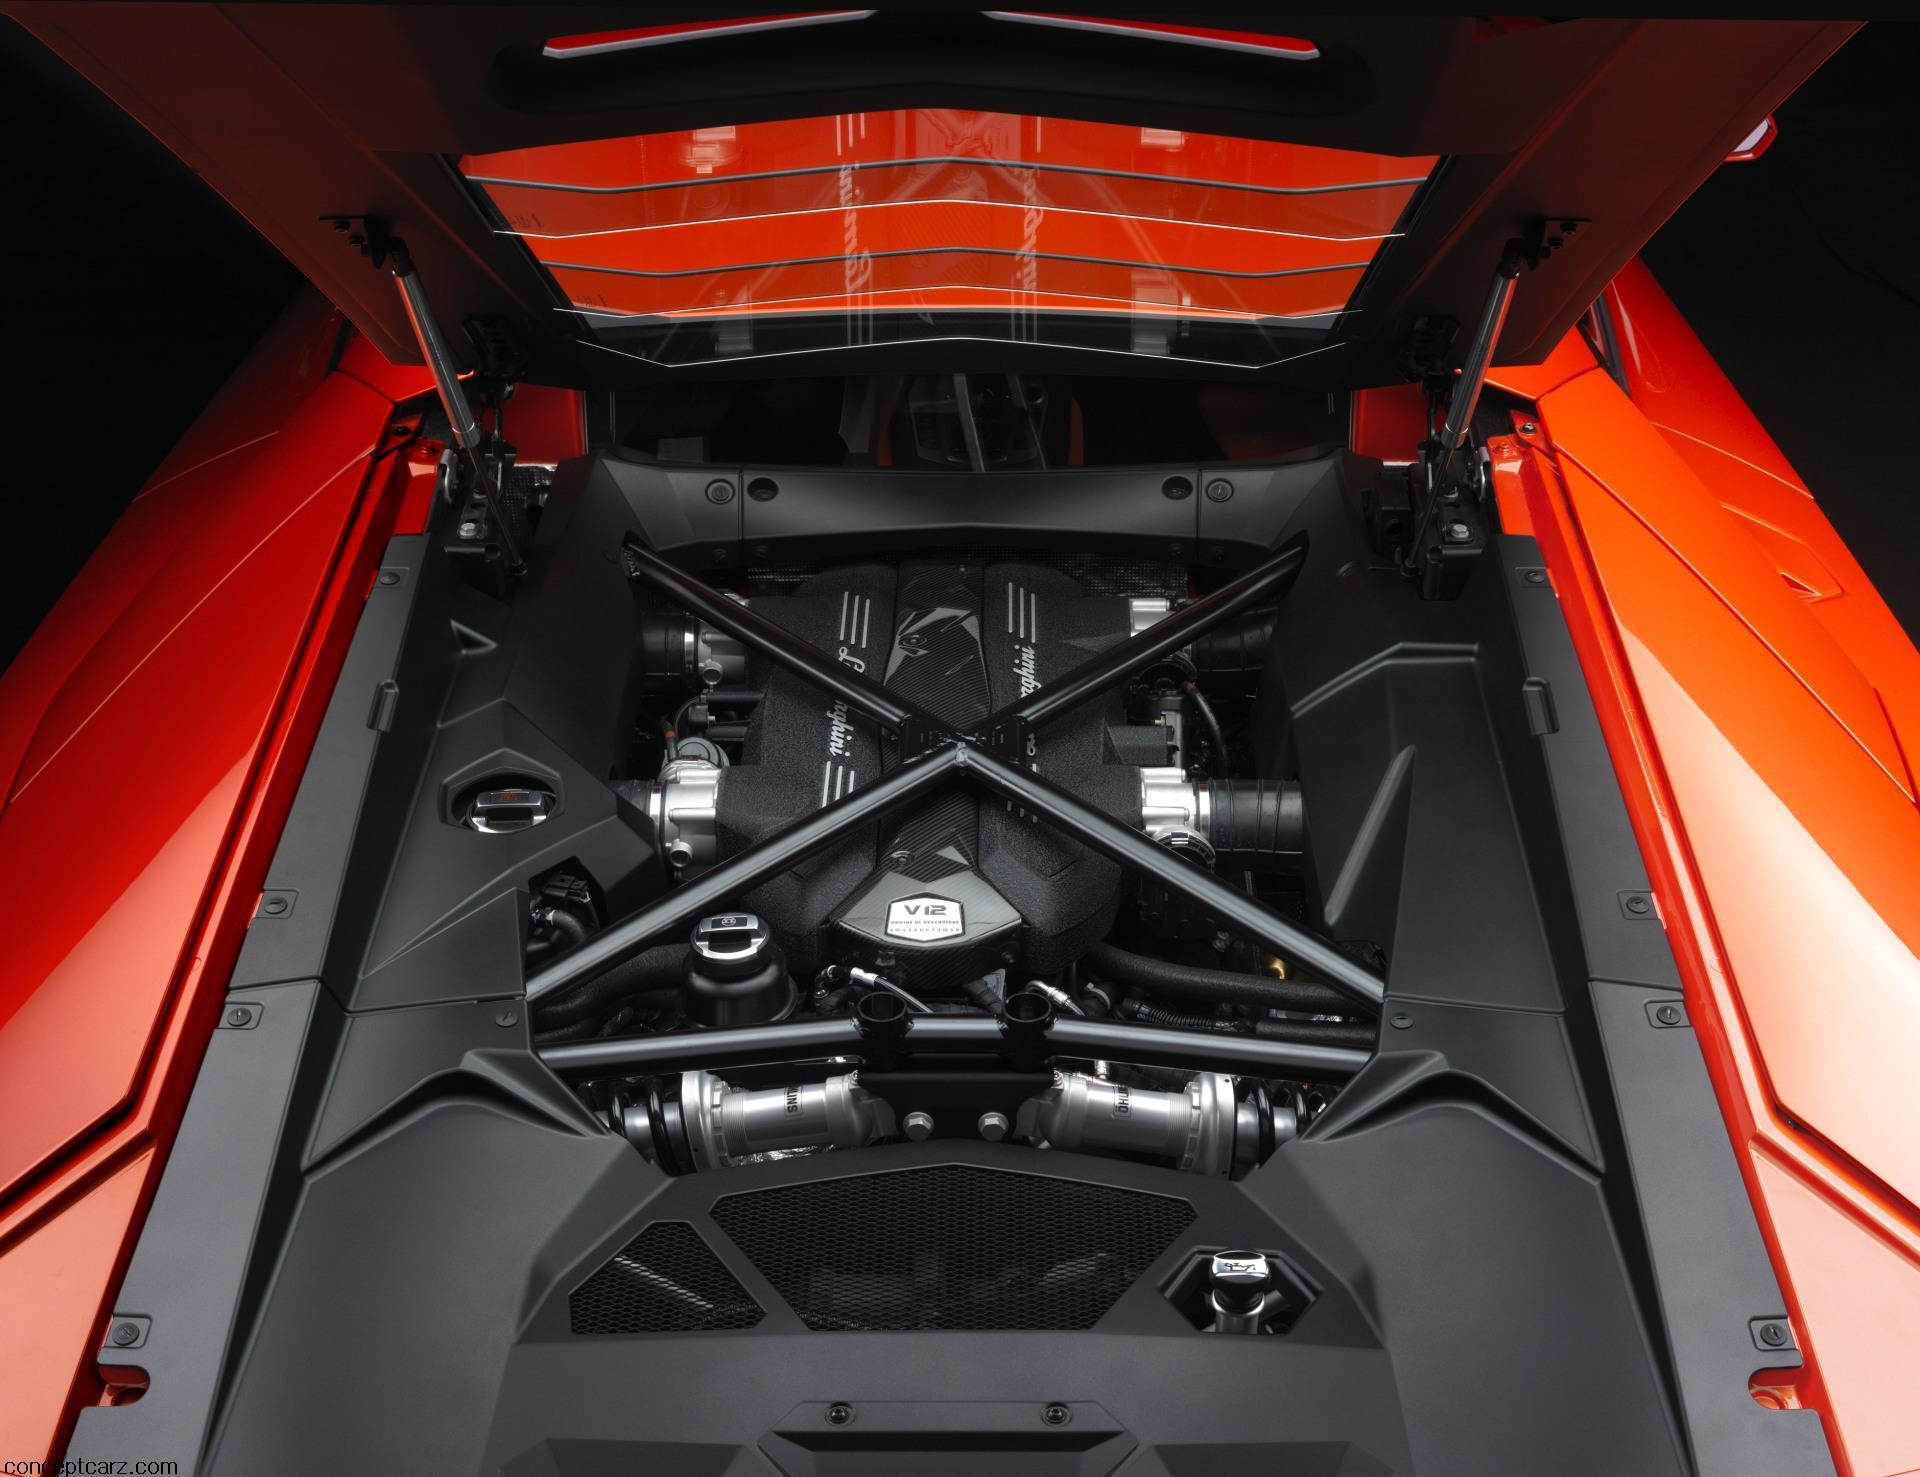 2012 Lamborghini Aventador LP 700-4 Image